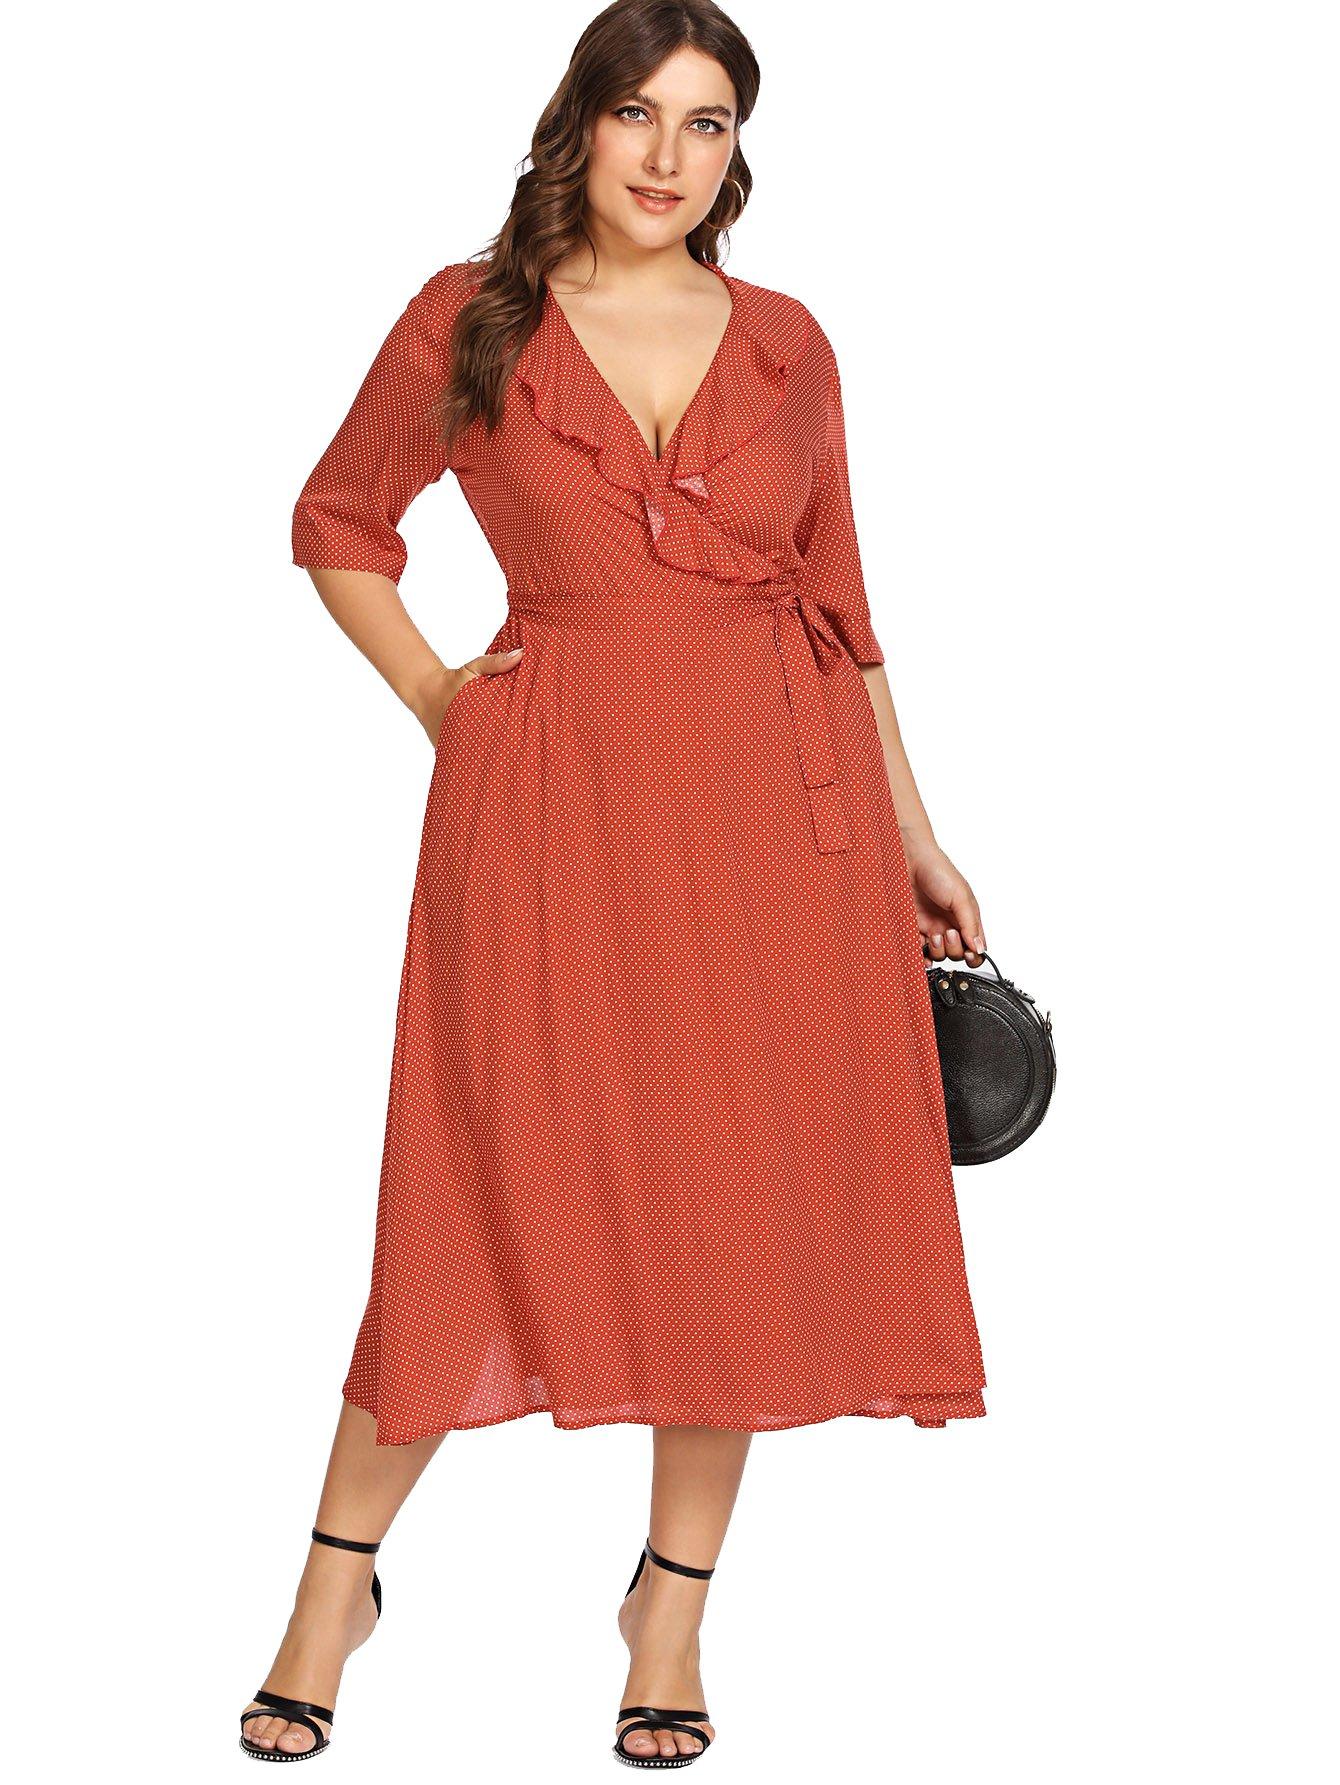 6a142b2574 Milumia Plus Size Dress Pockets Ruffled Wrap V Neck Maxi Dresses Empire  Waist Half Sleeves Orange 2X